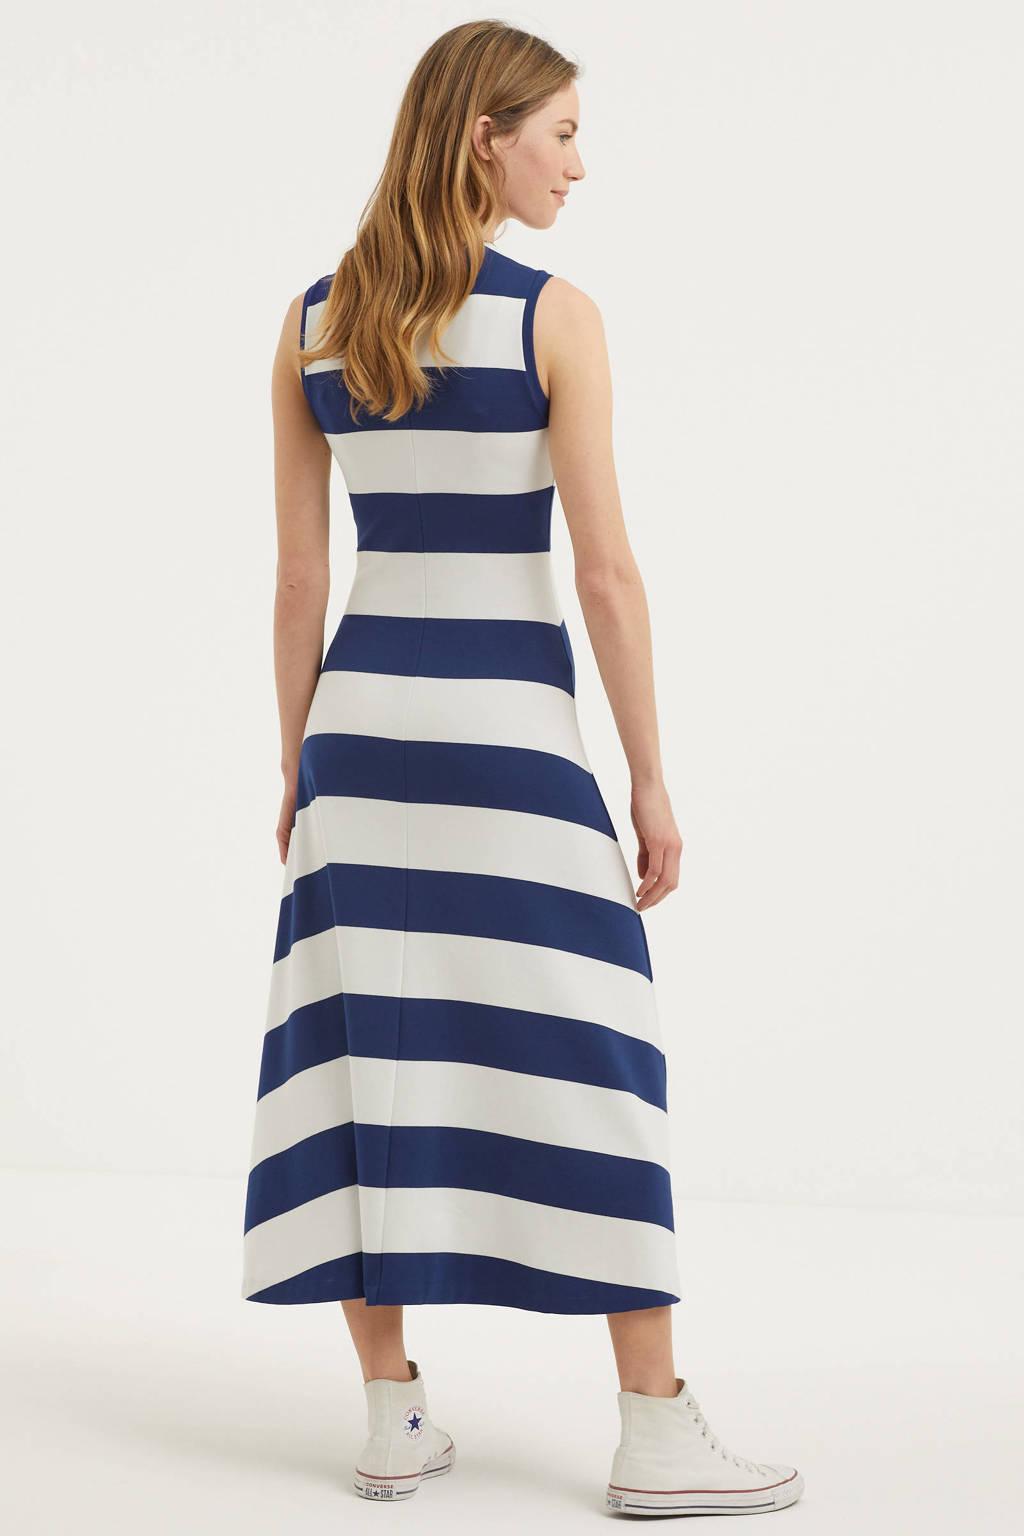 POLO Ralph Lauren gestreepte maxi jurk blauw/wit, Blauw/wit